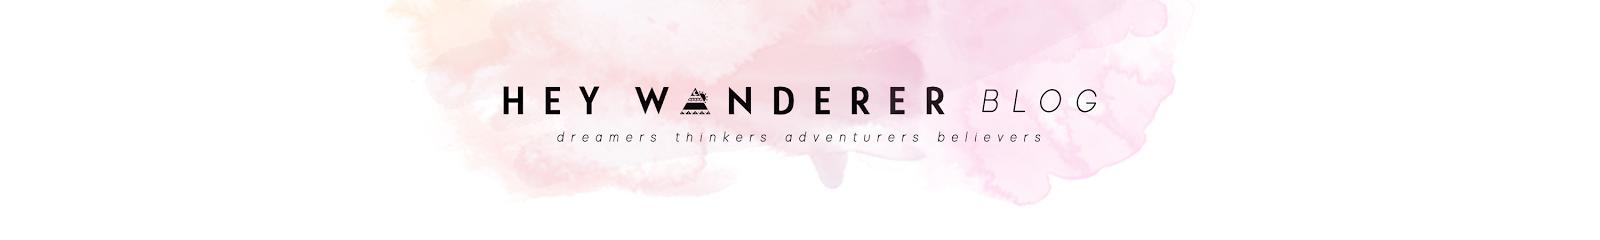 Hey Wanderer